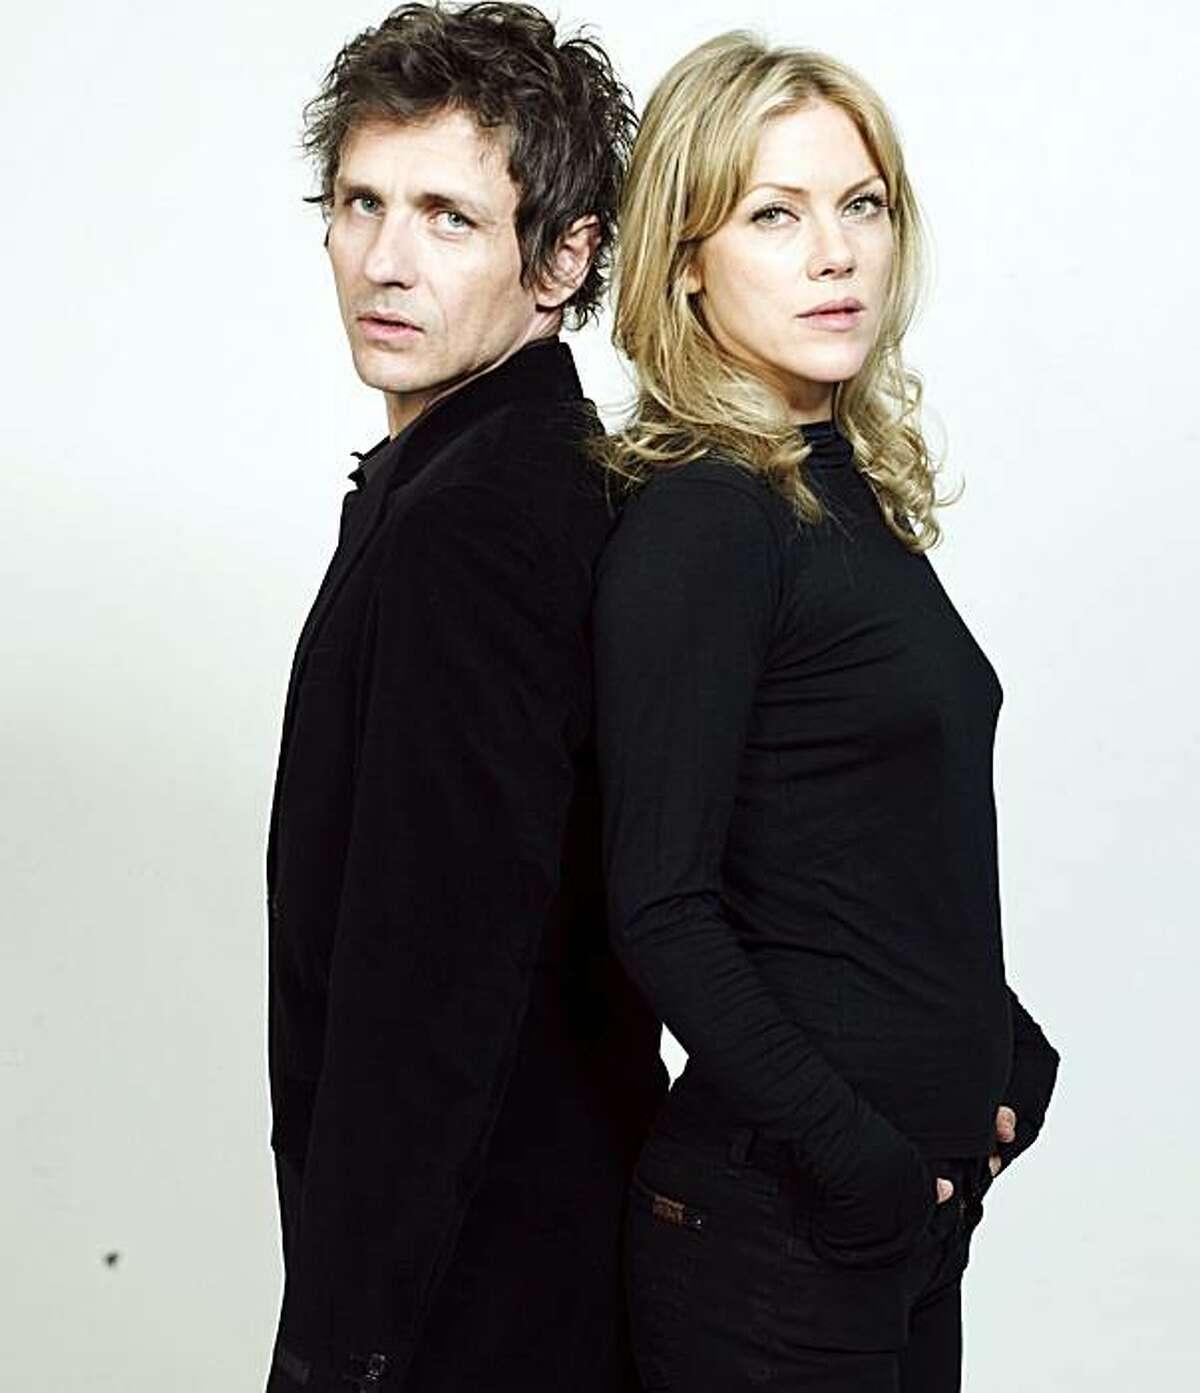 Dean Wareham and his wife Britta